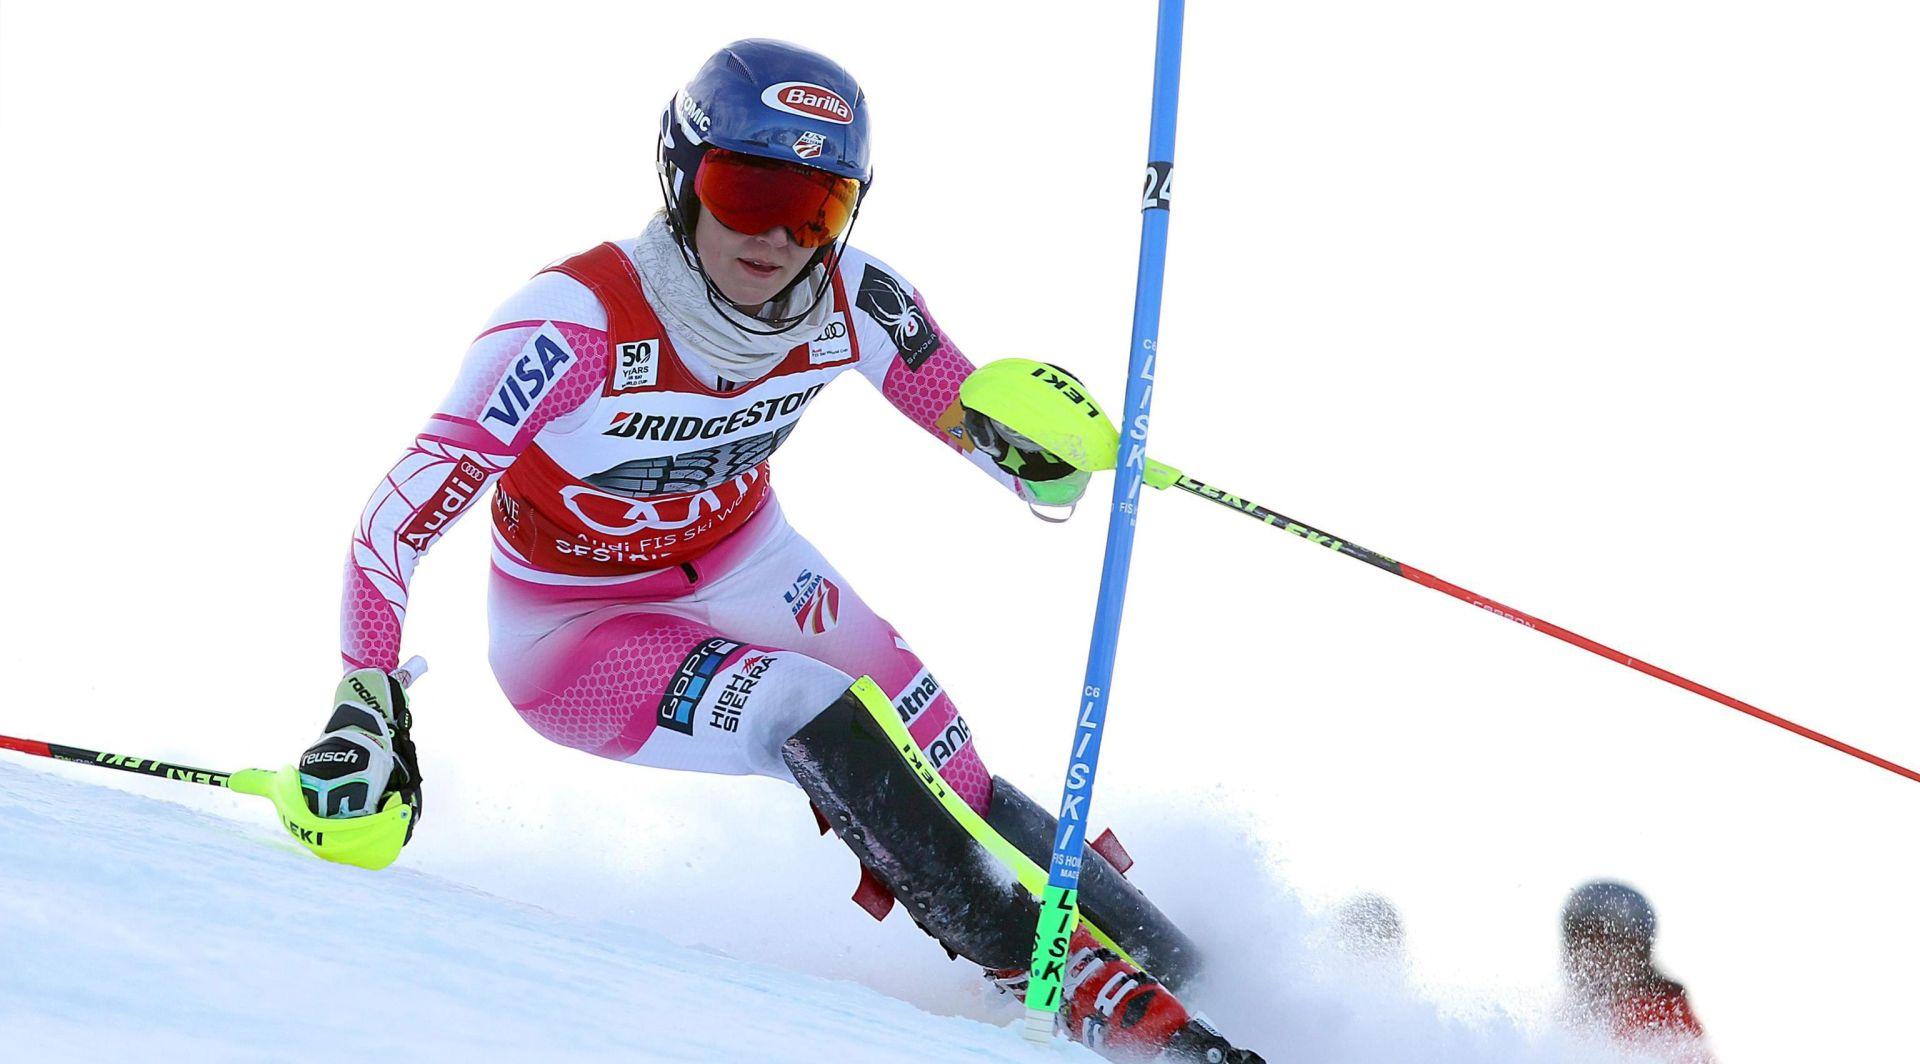 Shiffrin pobjednica slaloma u Sestriereu